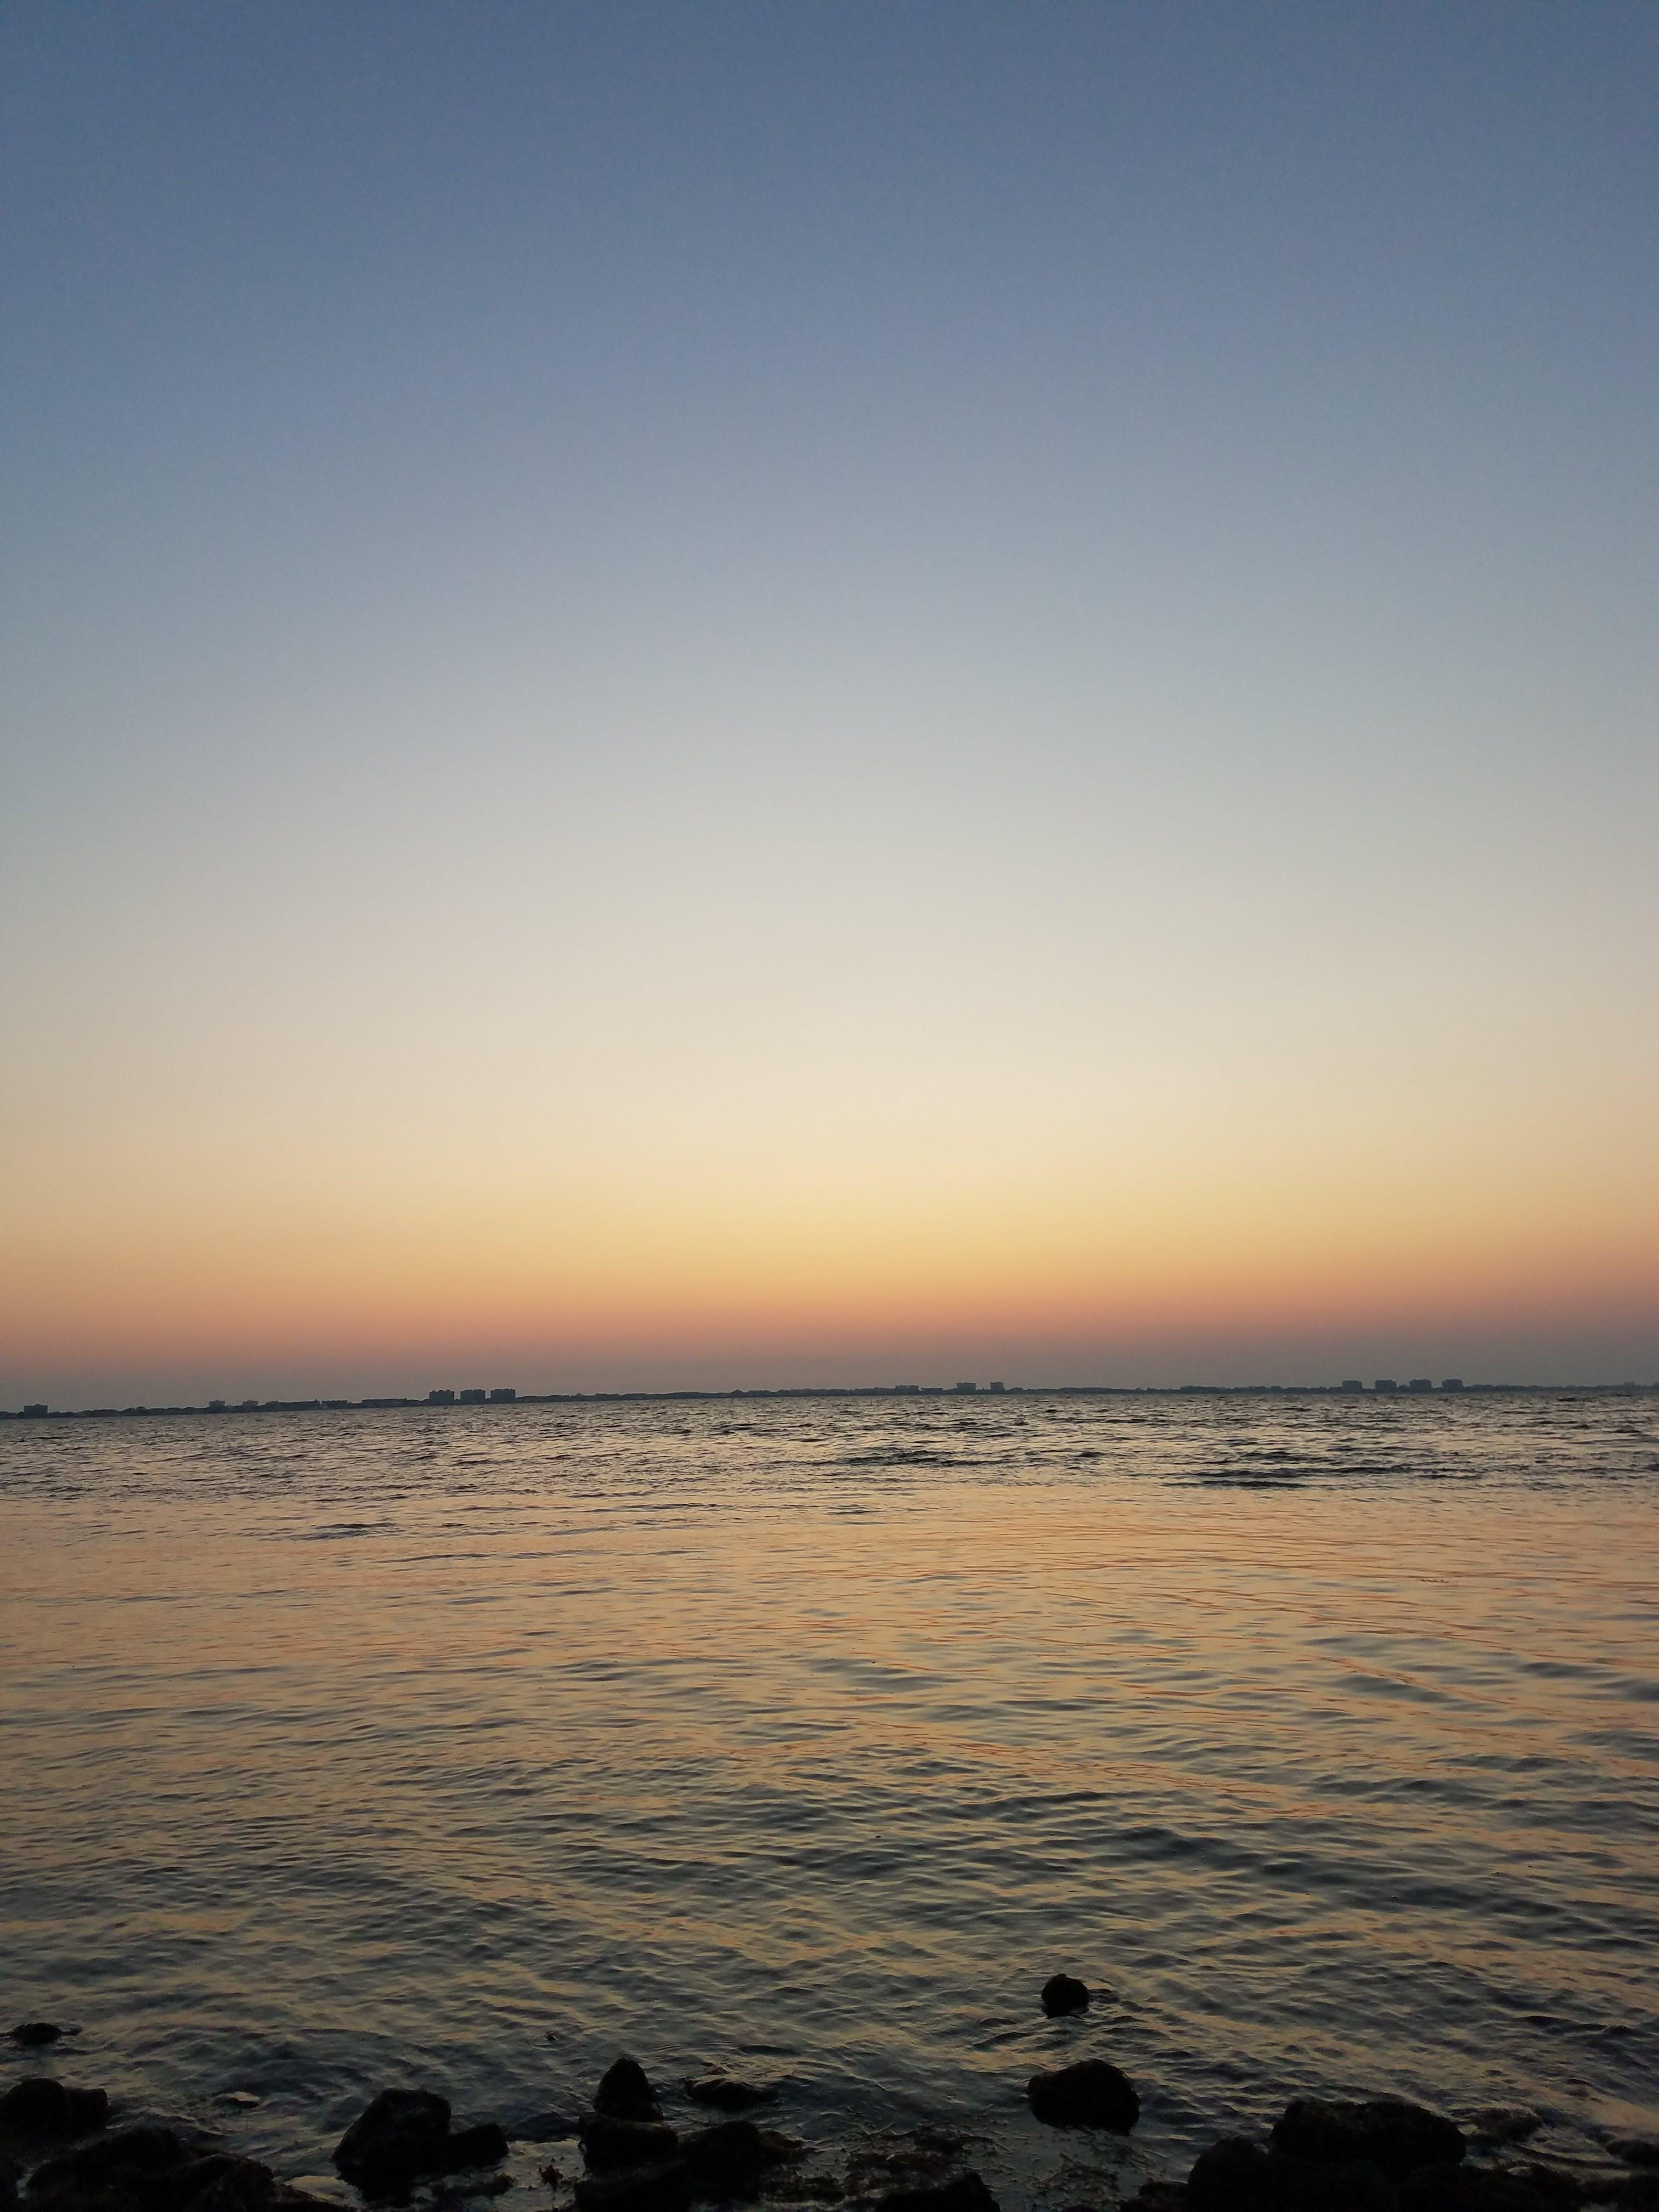 Kostenloses Stock Foto zu #sunset #water #ocean #florida #warm